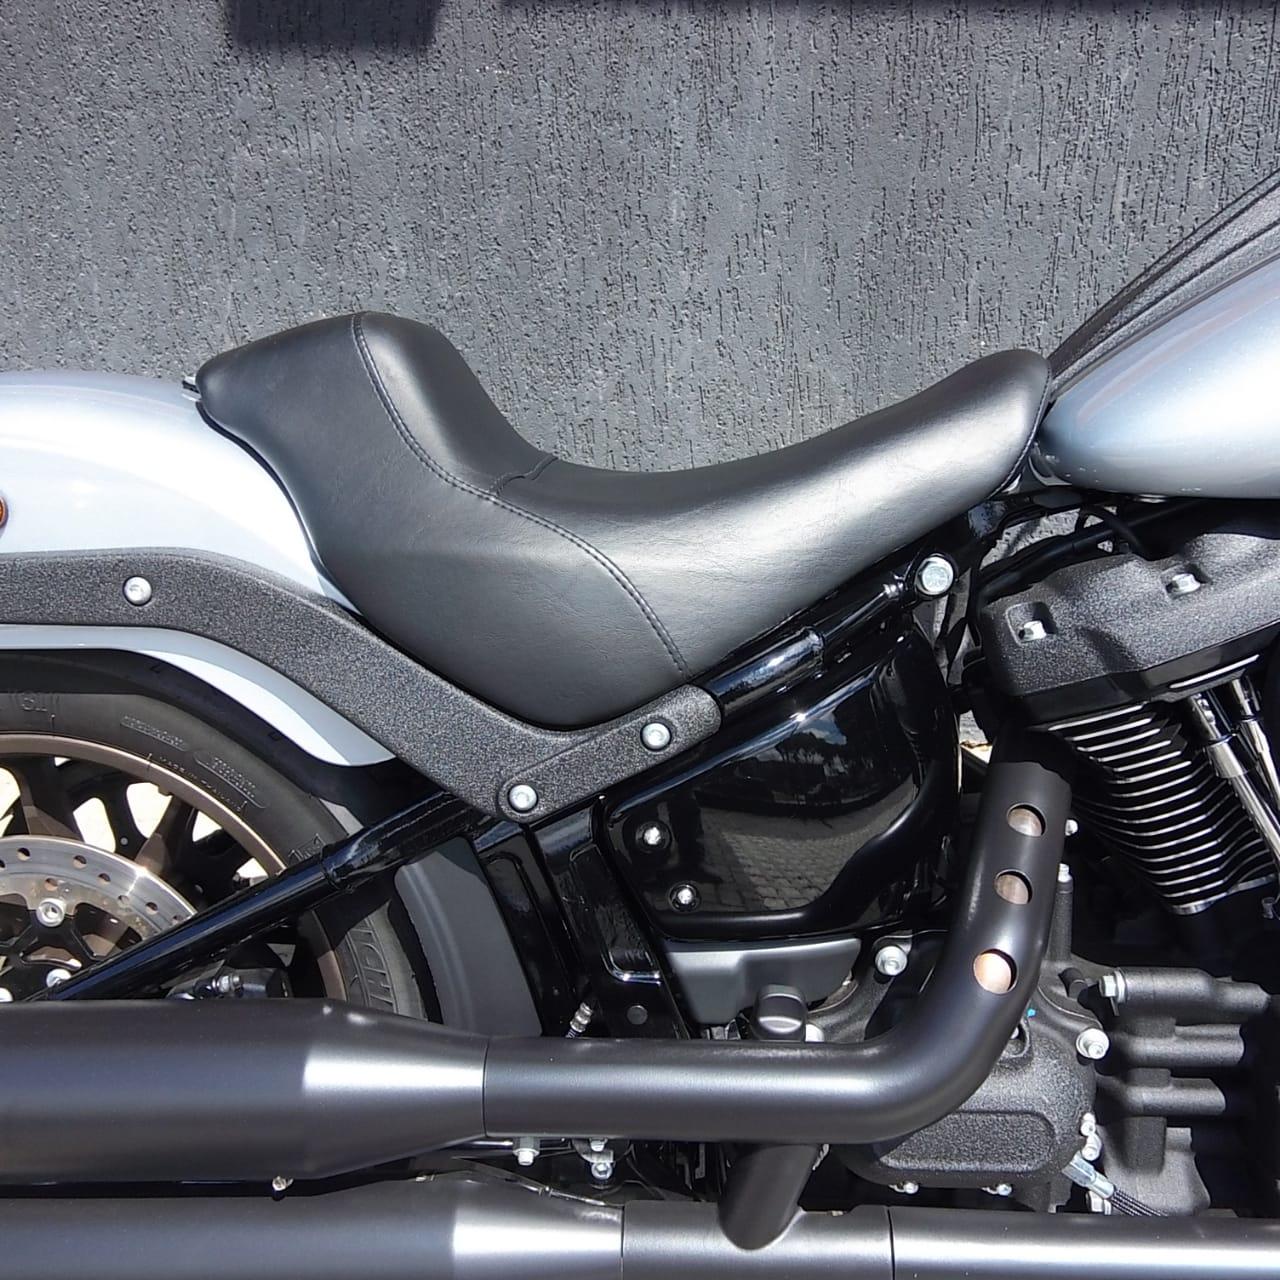 Harley-Davidson Softail Low Rider S Prata - 2020/2020 - 036/76802